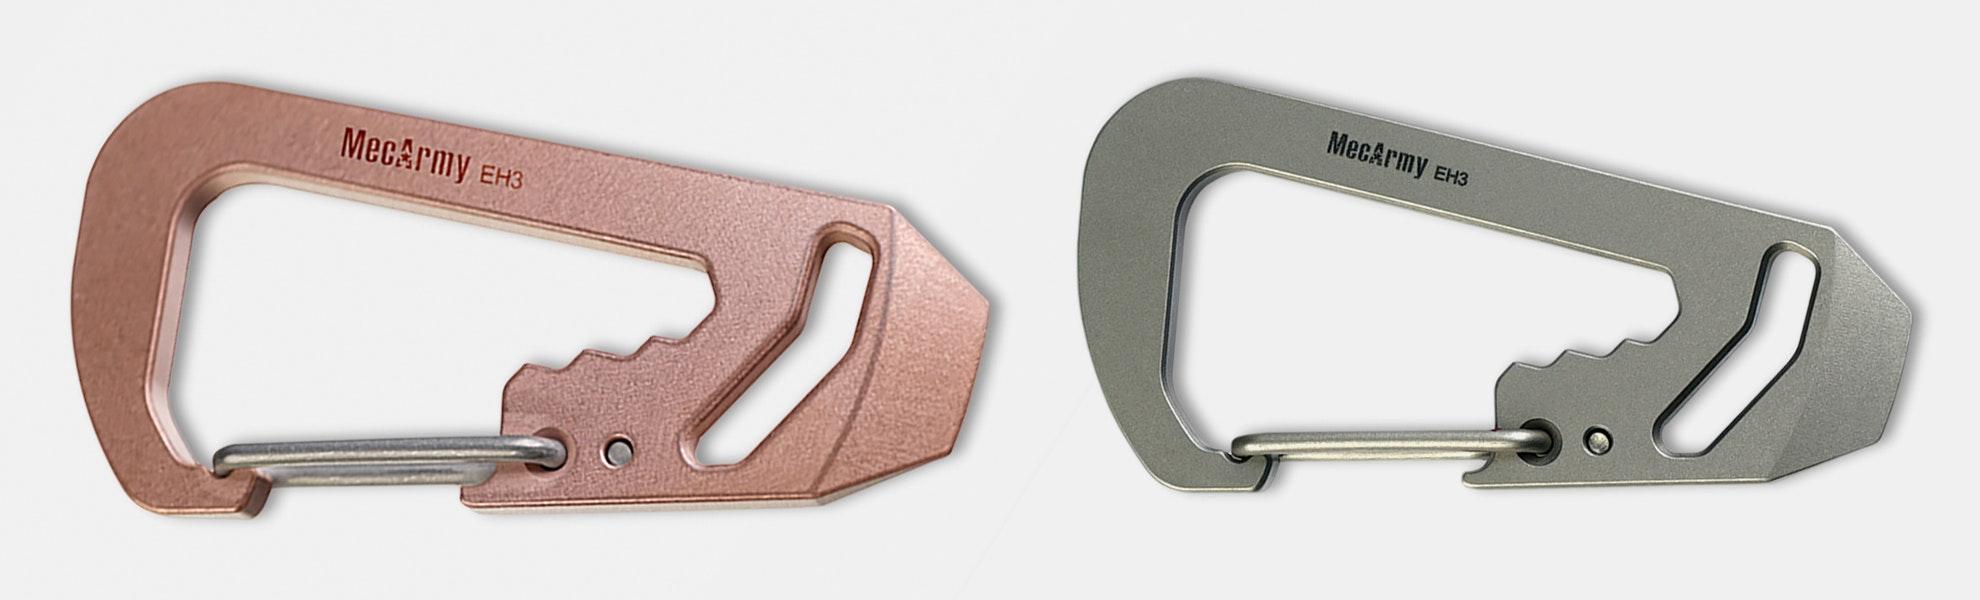 MecArmy Copper & Titanium Multifunctional Carabiner